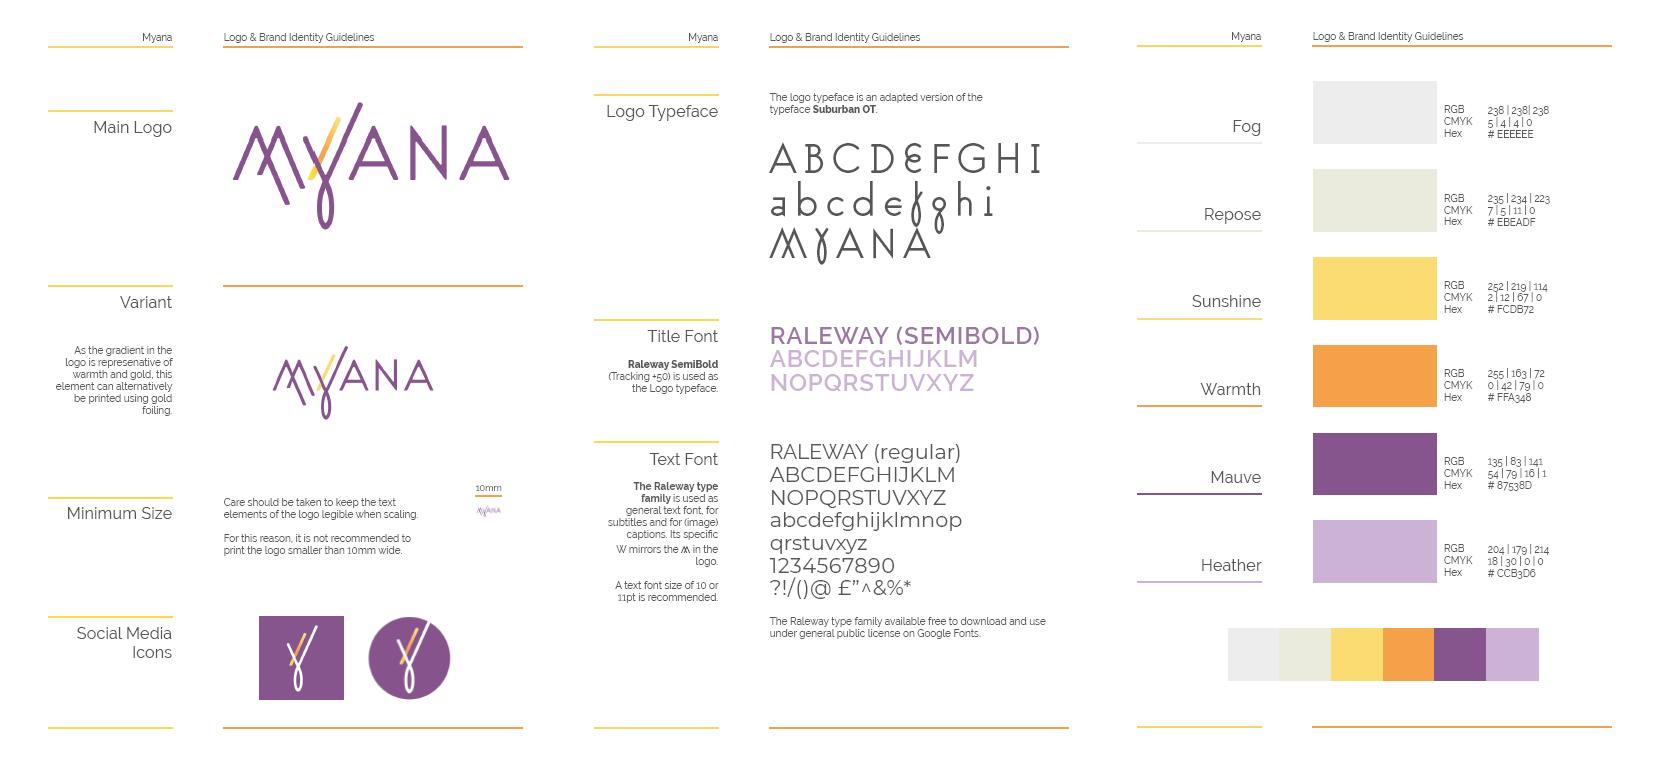 Apricity Studio Branding: New cosmetics brand Myana Naturals logo guidelines